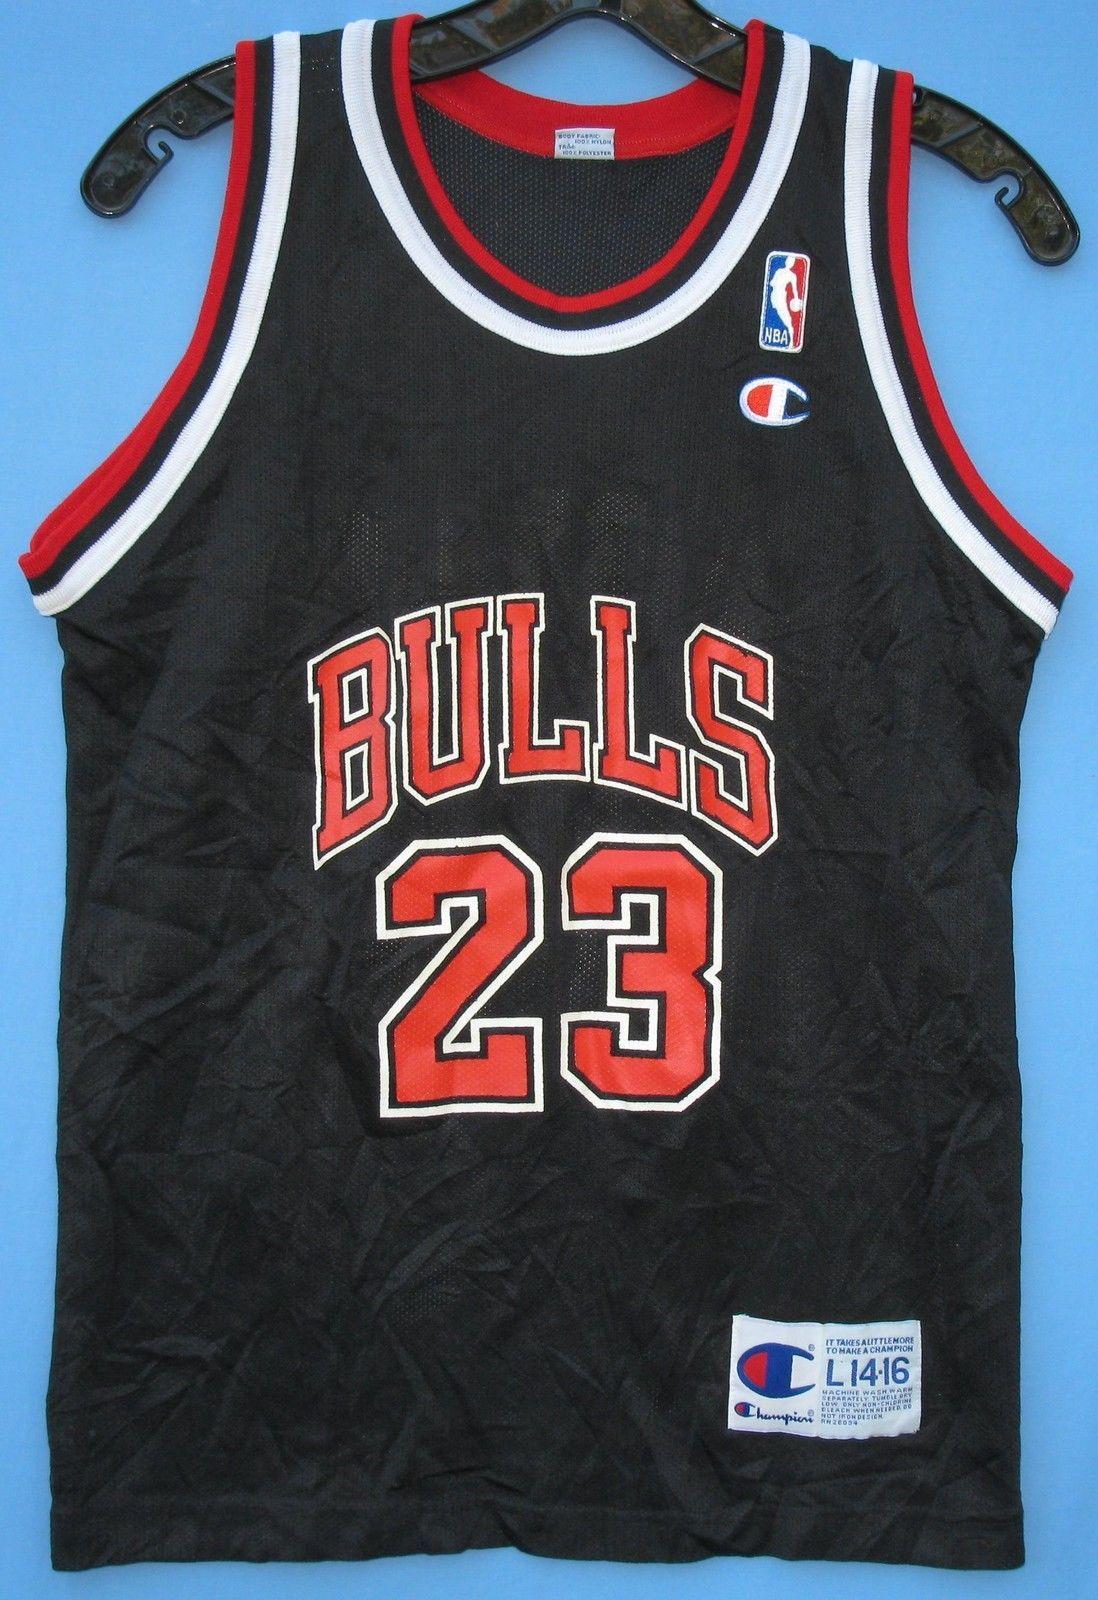 separation shoes 5e234 16dc4 Vintage Champion Chicago Bulls jersey | Jordan Collectables ...